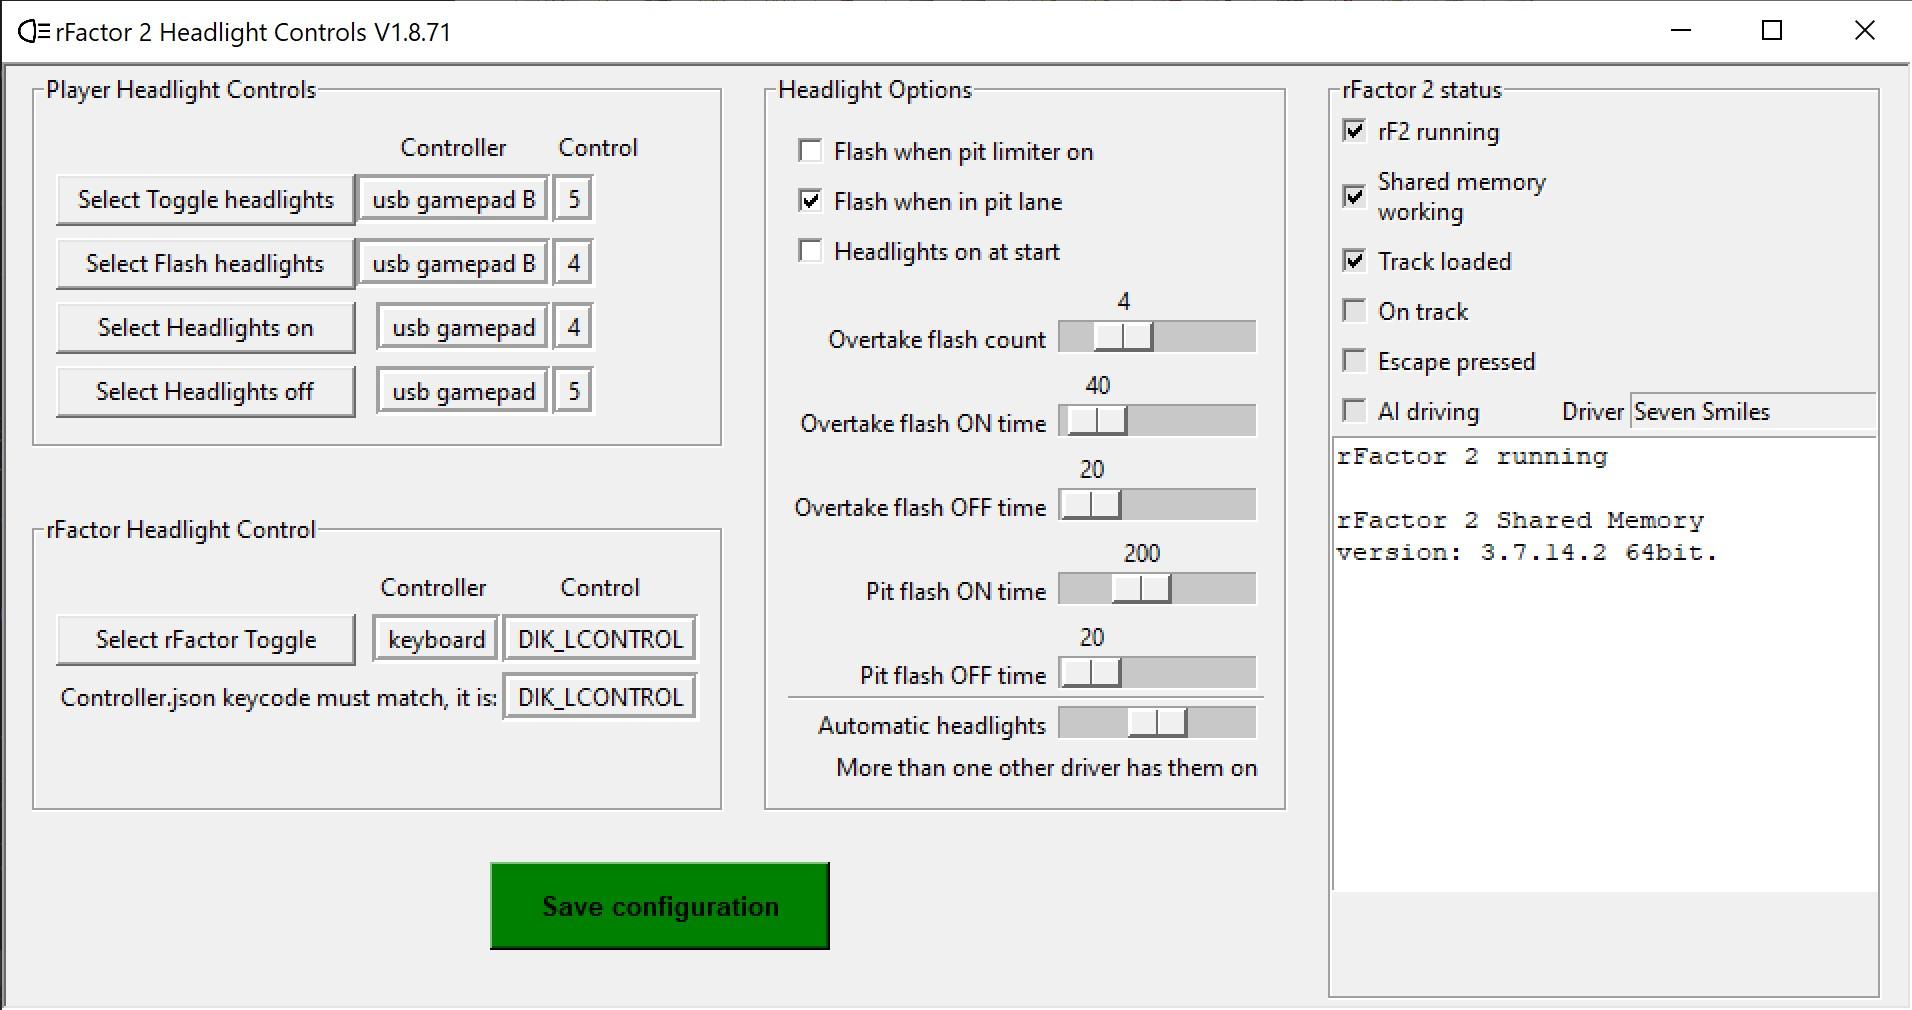 rF2headlights-1.8.71.jpg